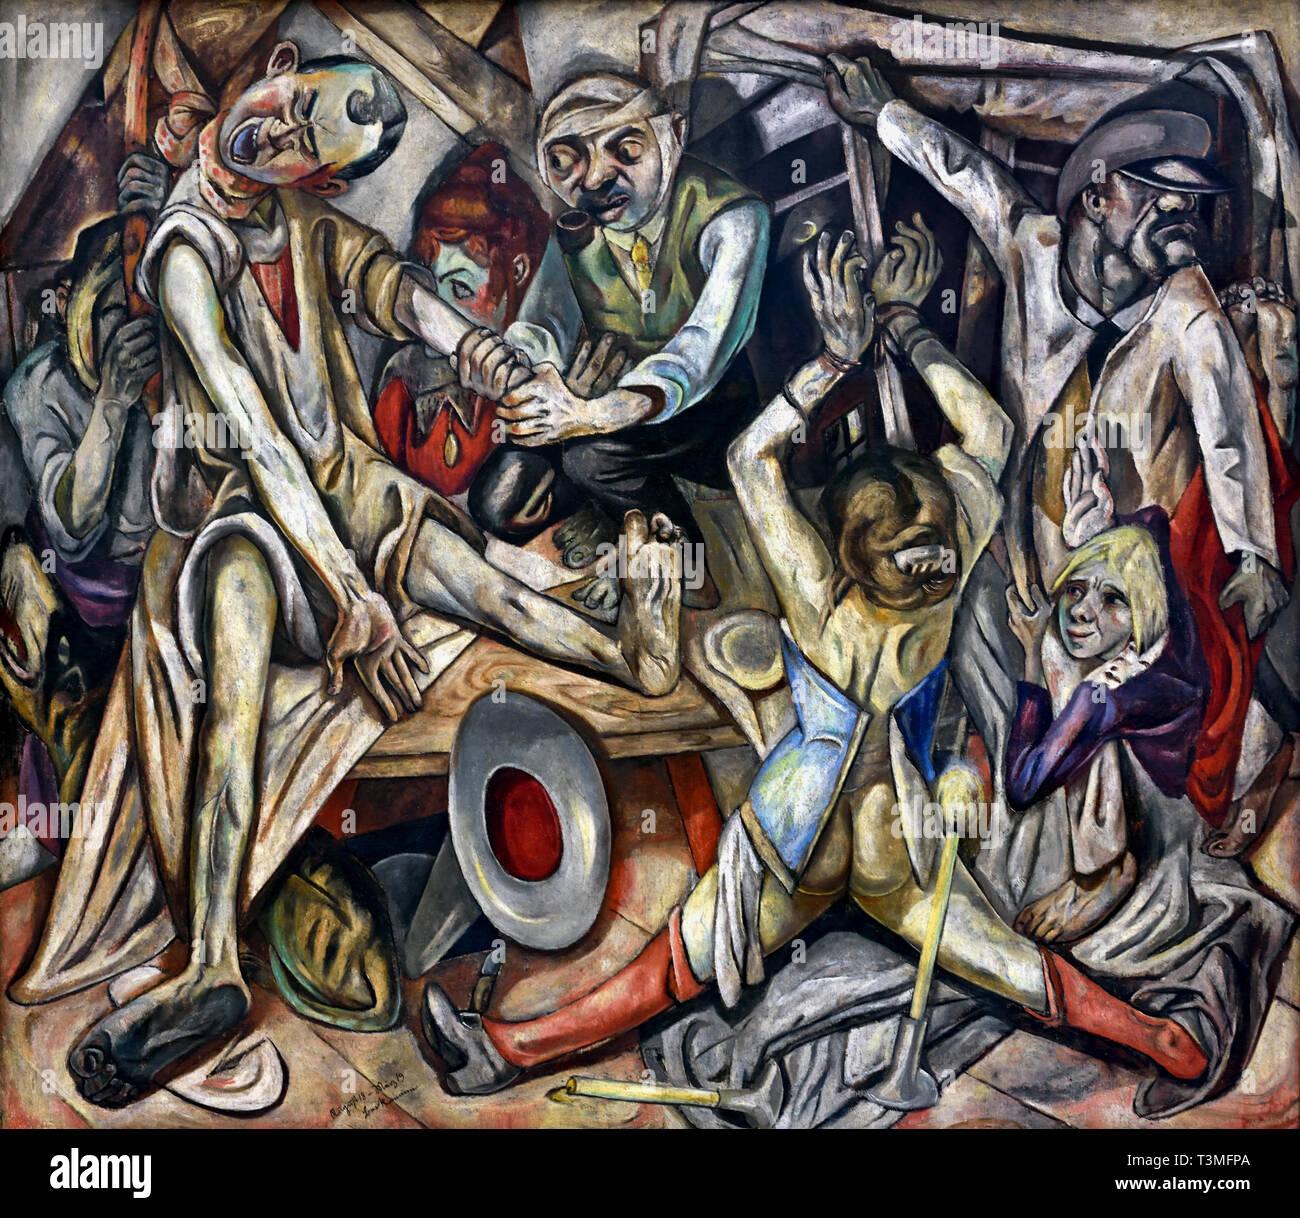 Die Nacht - Notte 1918-19 di Max Beckmann (1884 - 1950) Tedesco Immagini Stock